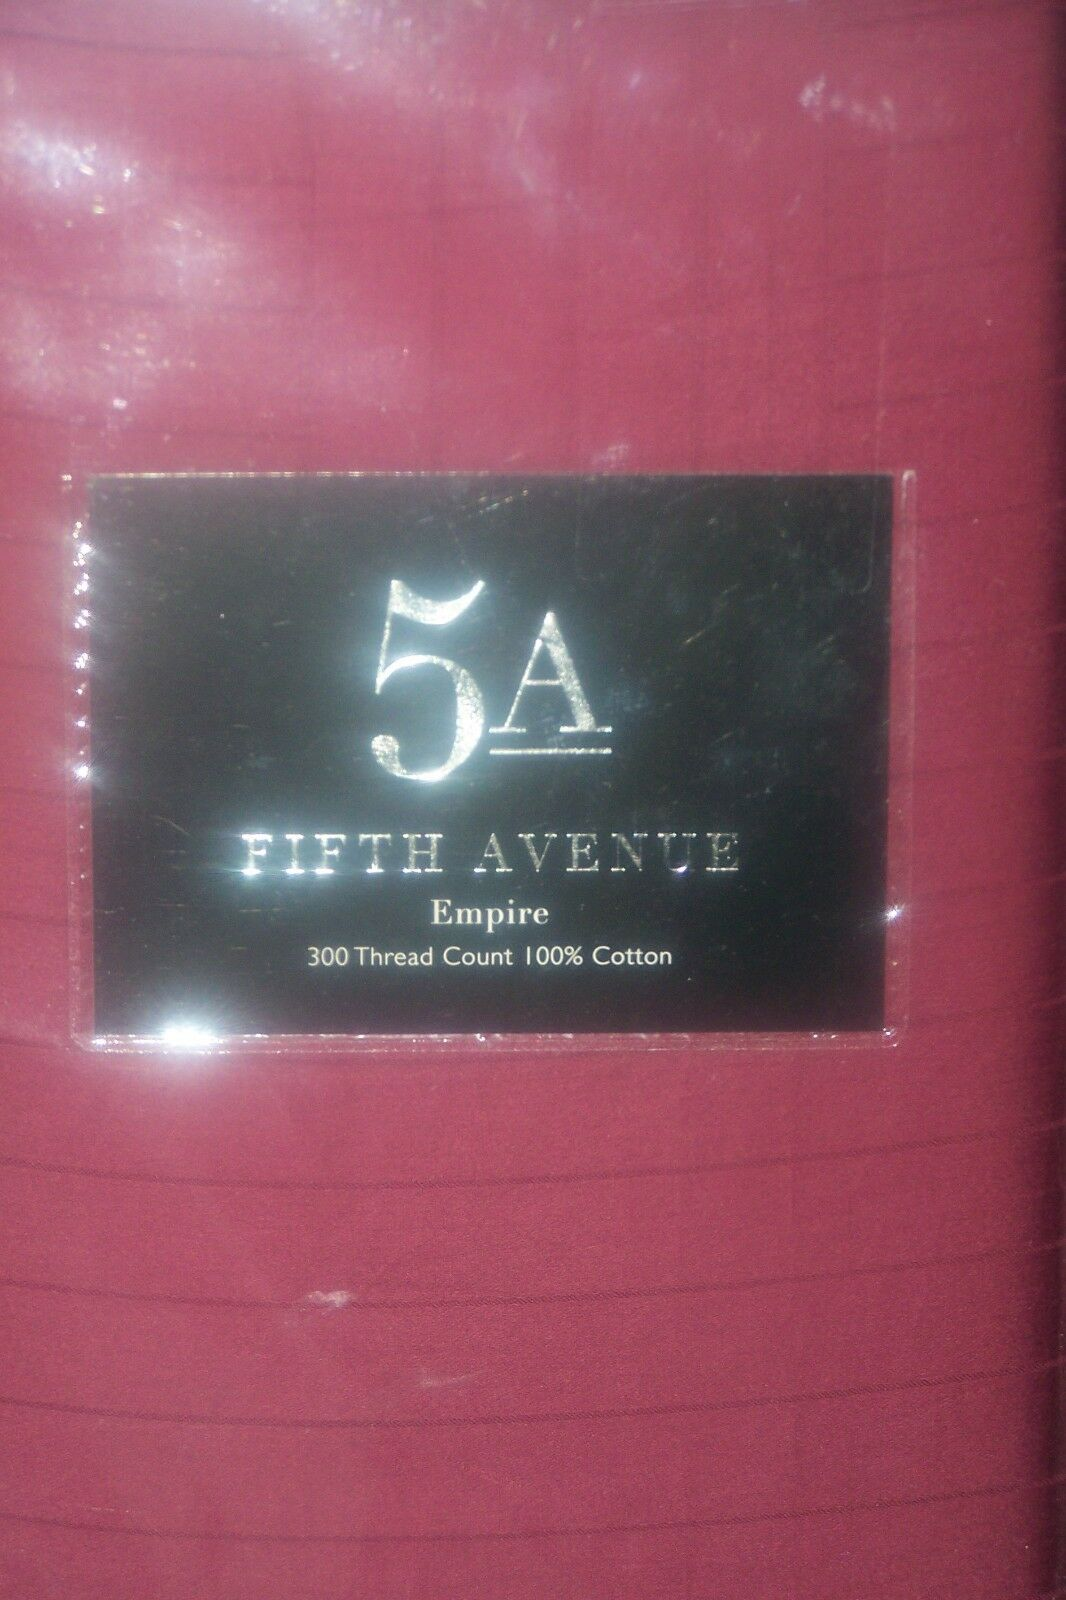 New 5A Fifth Avenue King Größe Duvet Quilt cover + 2 p cases...  Empire Burgandy